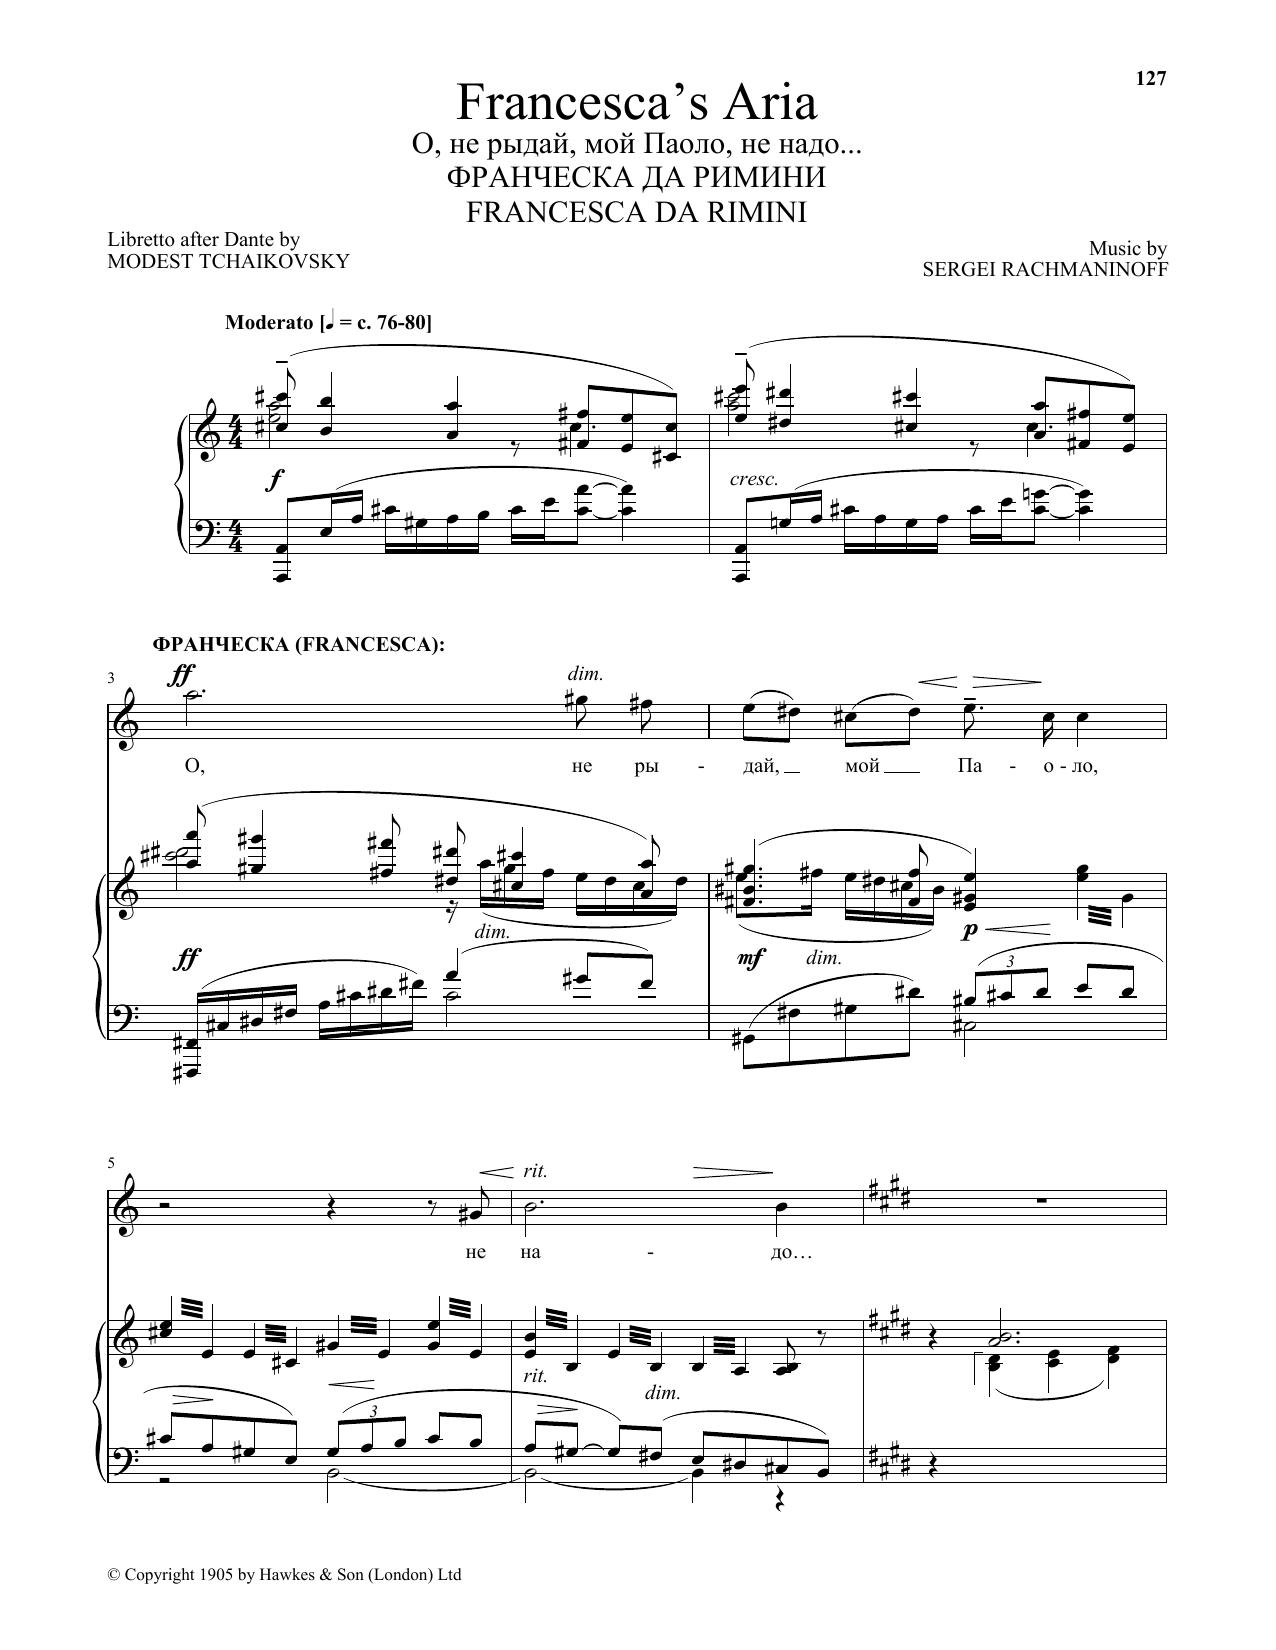 Sergei Rachmaninoff Francesca's Aria (from Francesca da Rimini) sheet music notes and chords. Download Printable PDF.